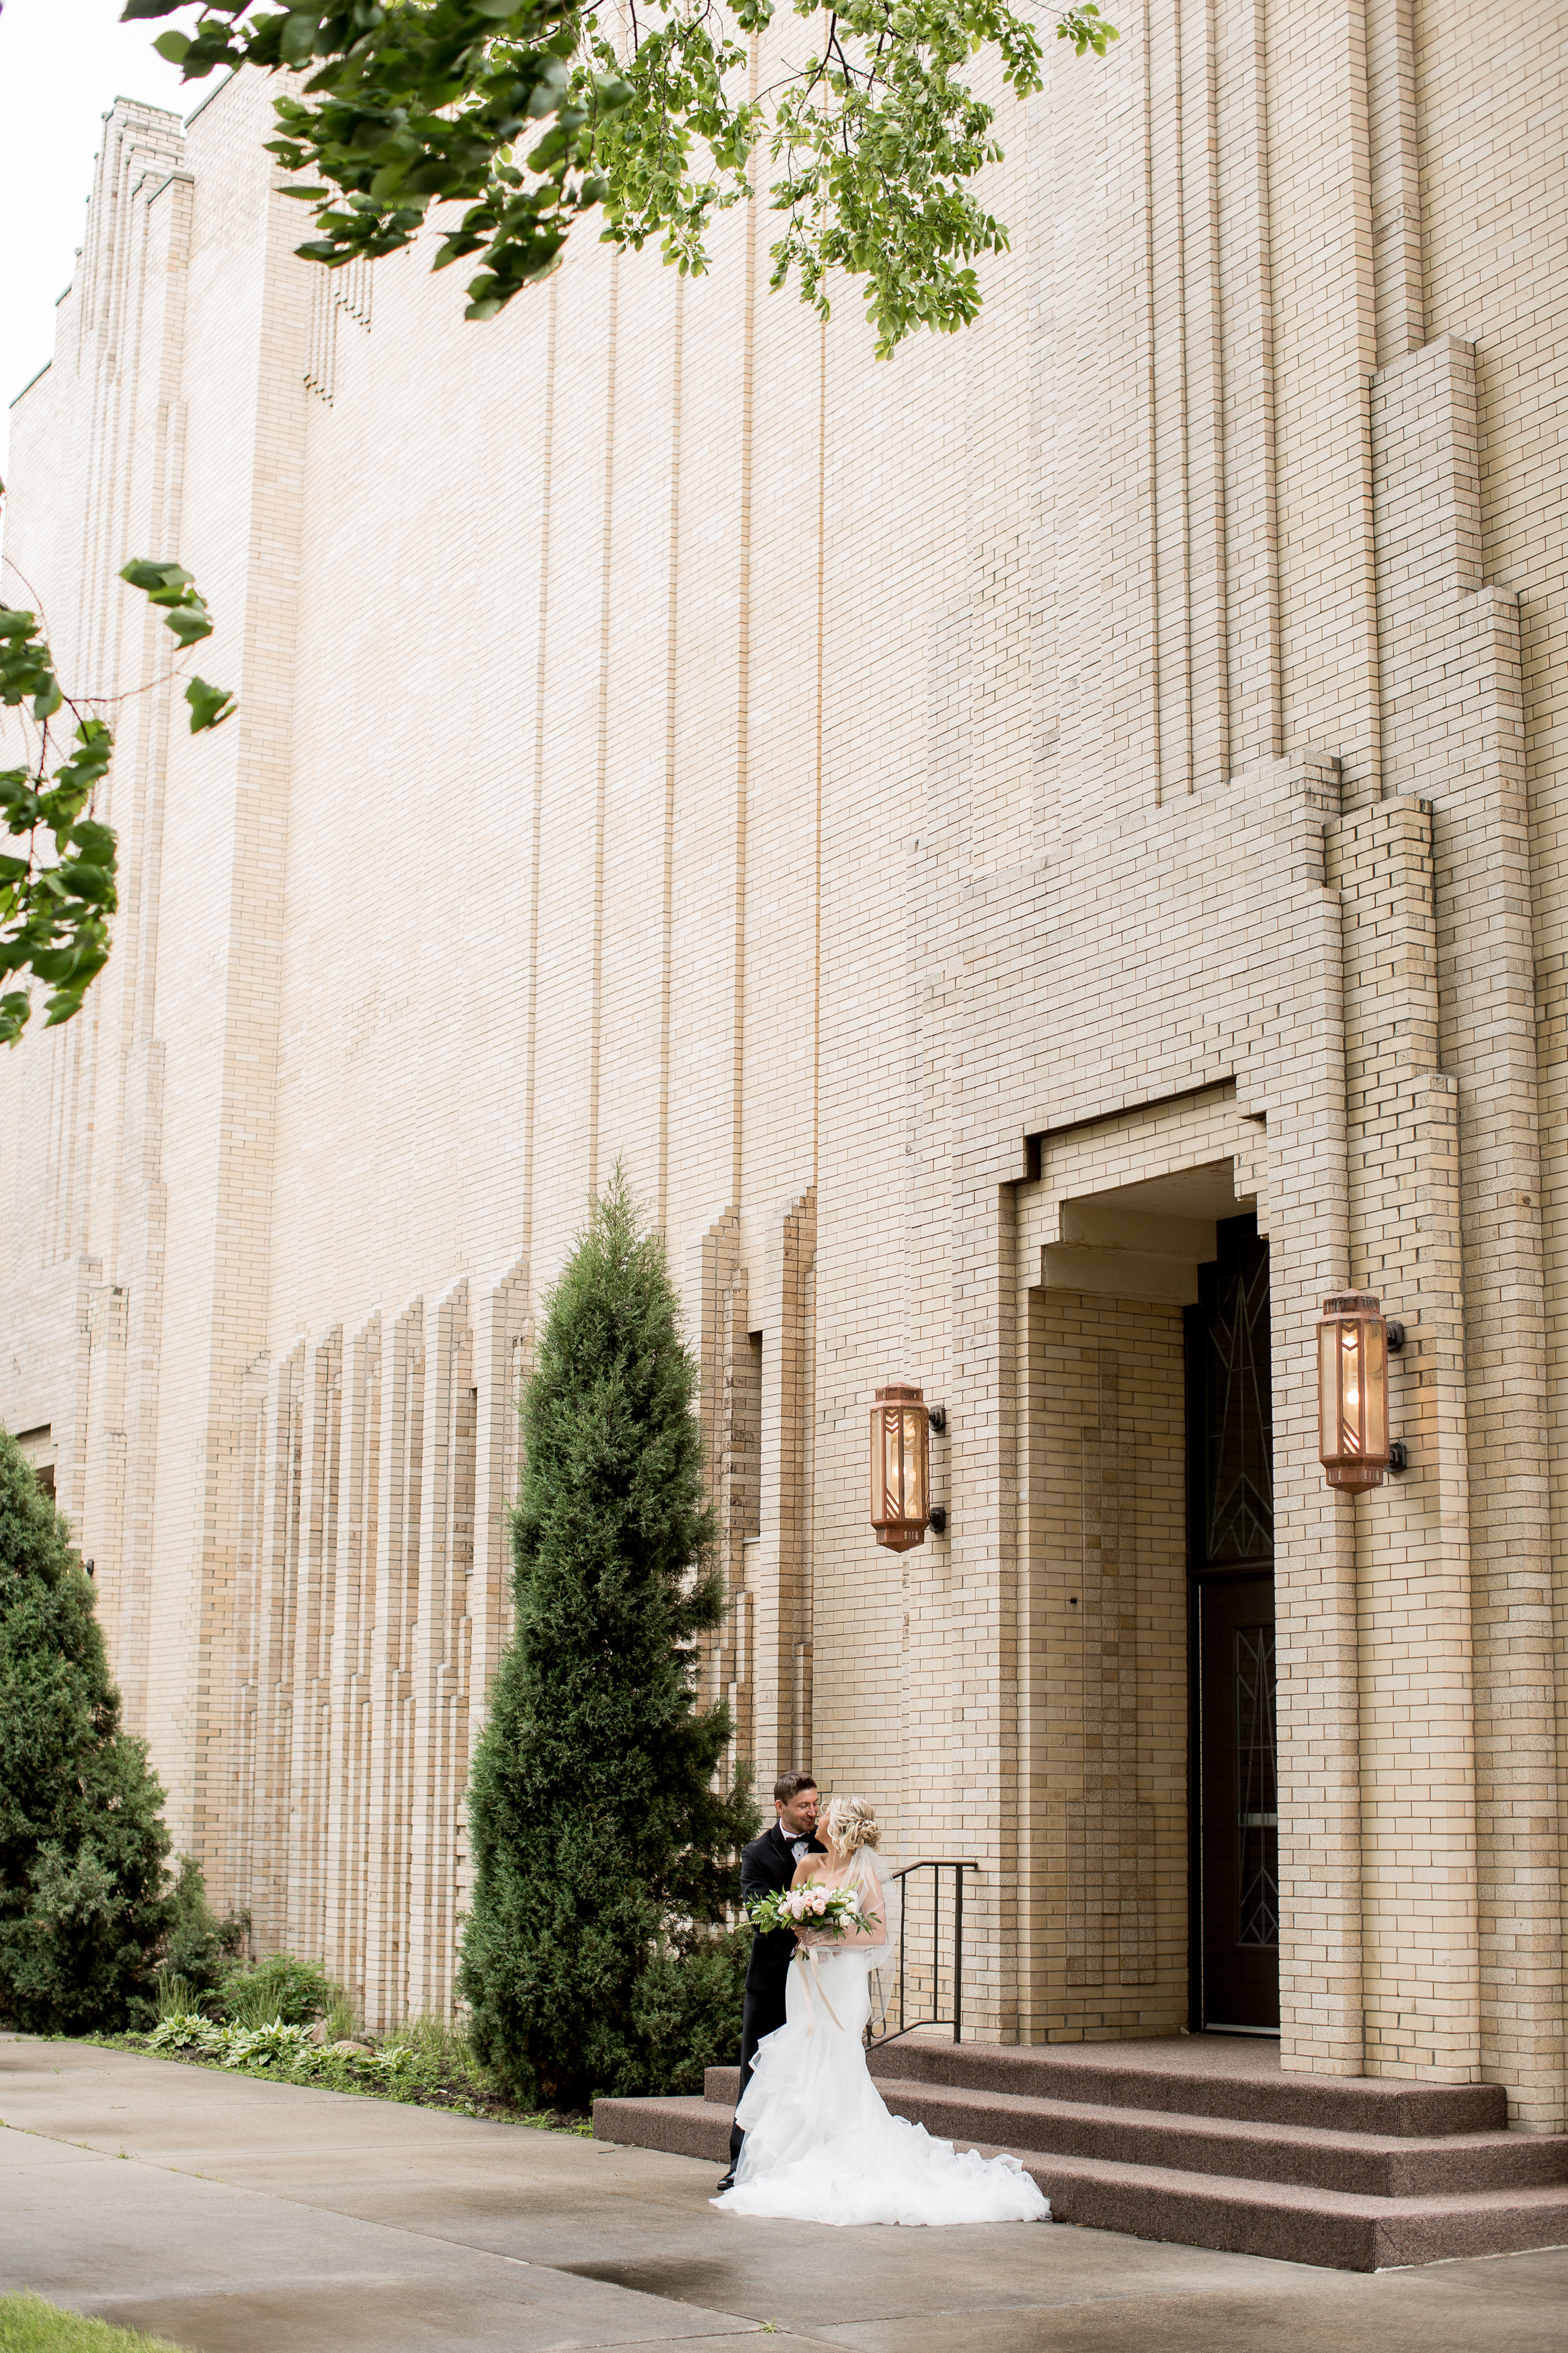 Church-143.jpg